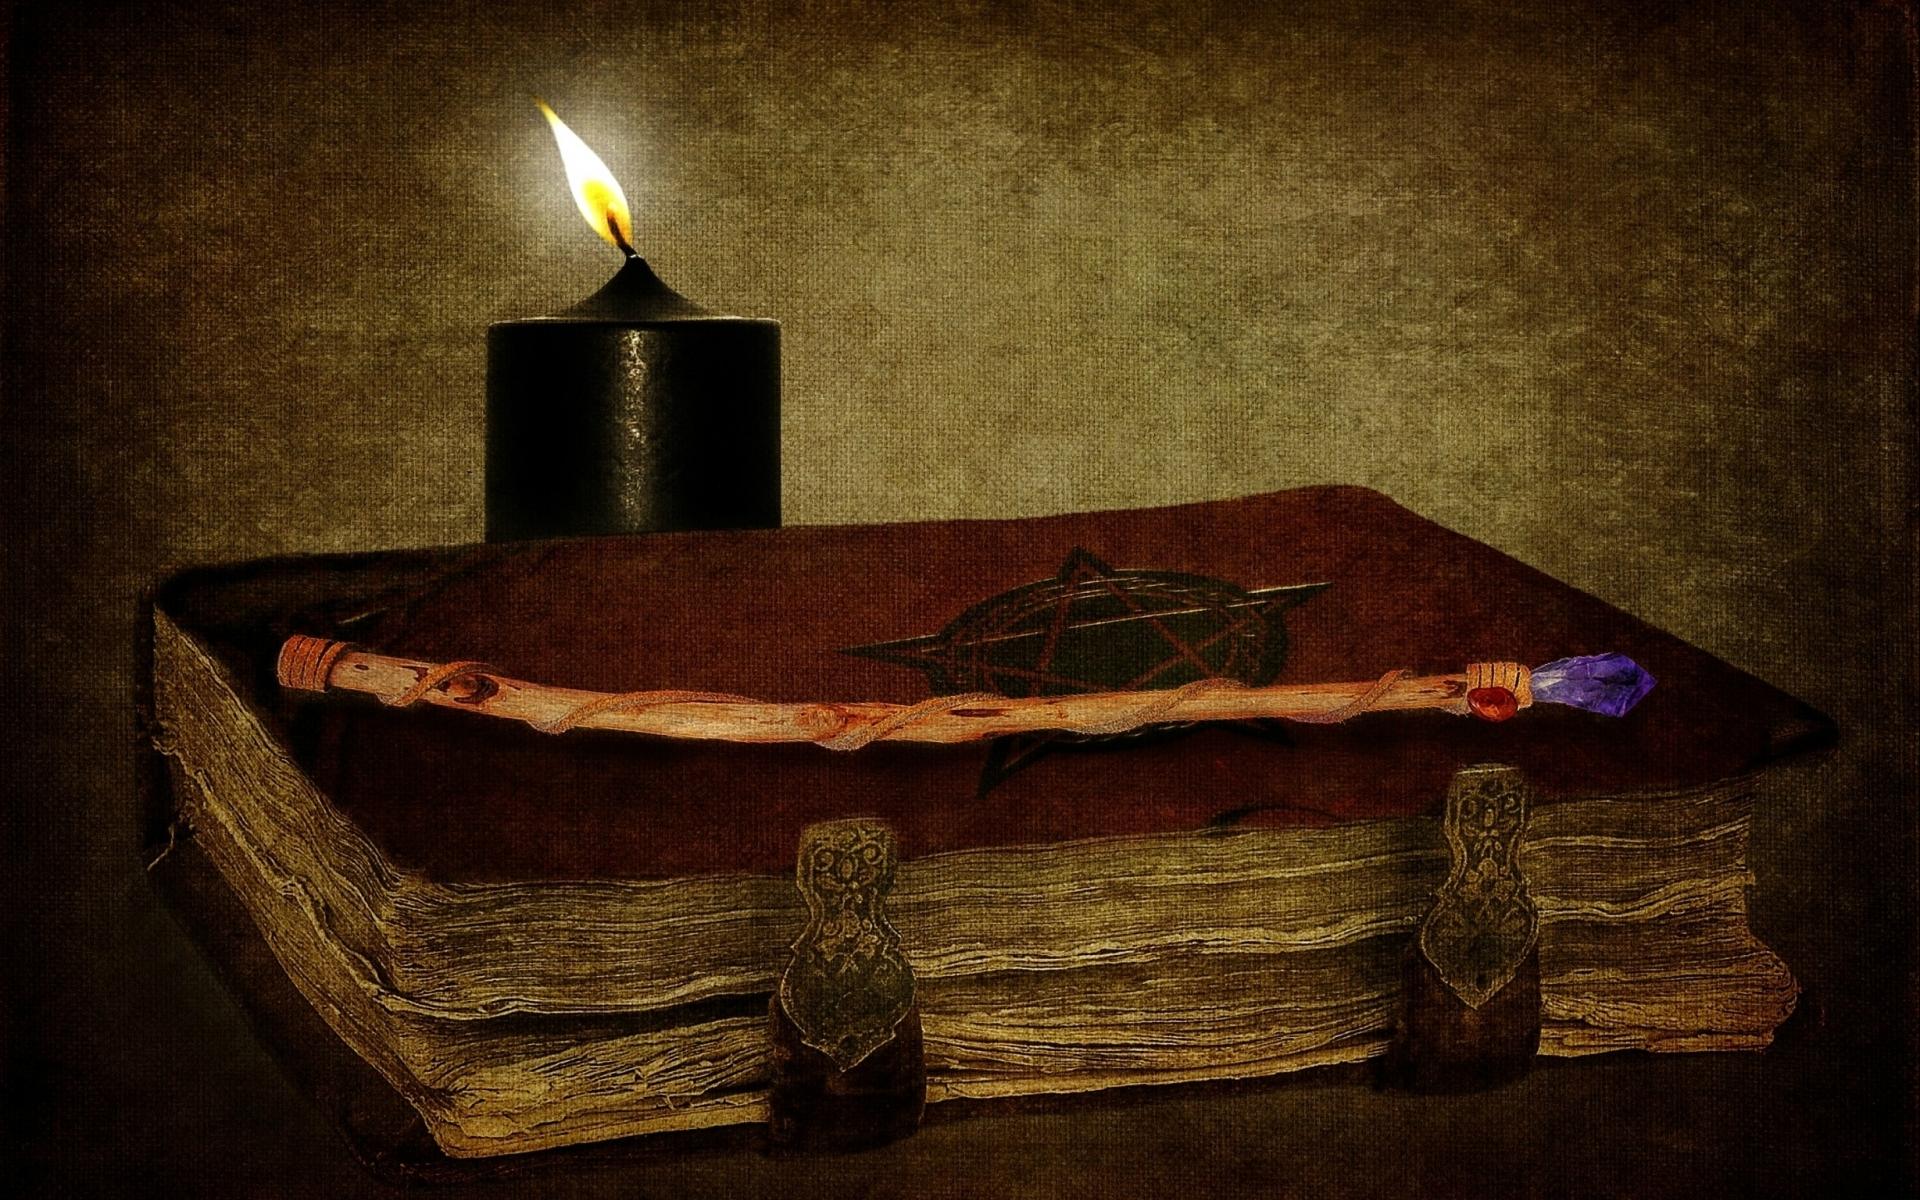 Wallpaper : 1920x1200 px, ART, book, candles, dark, Gothic